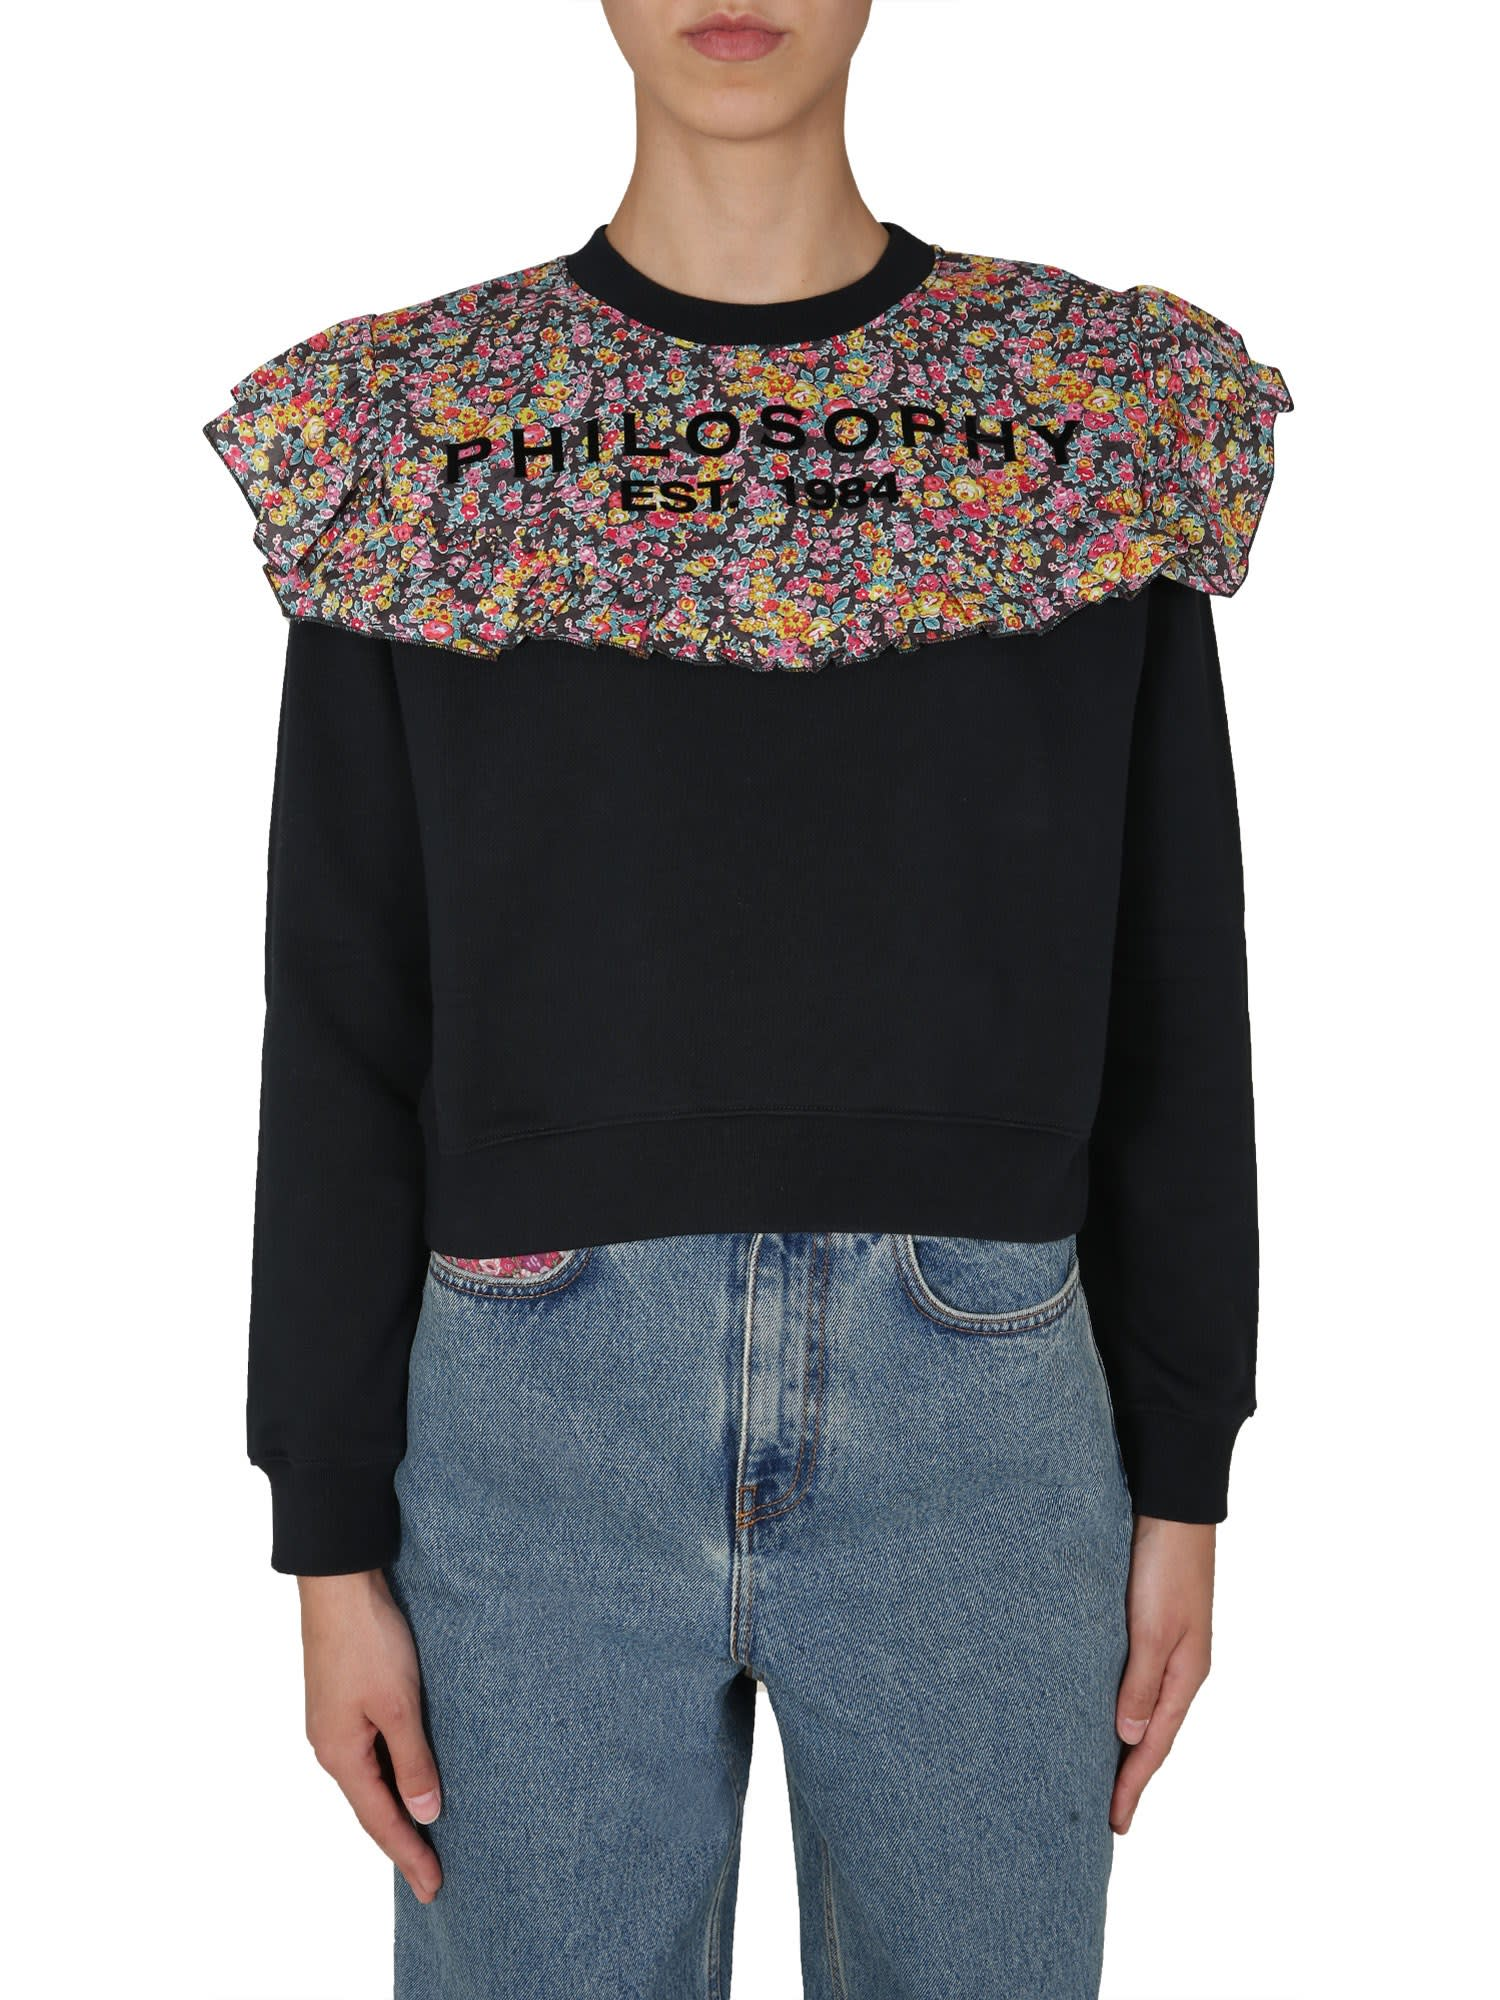 Philosophy di Lorenzo Serafini Cropped Sweatshirt